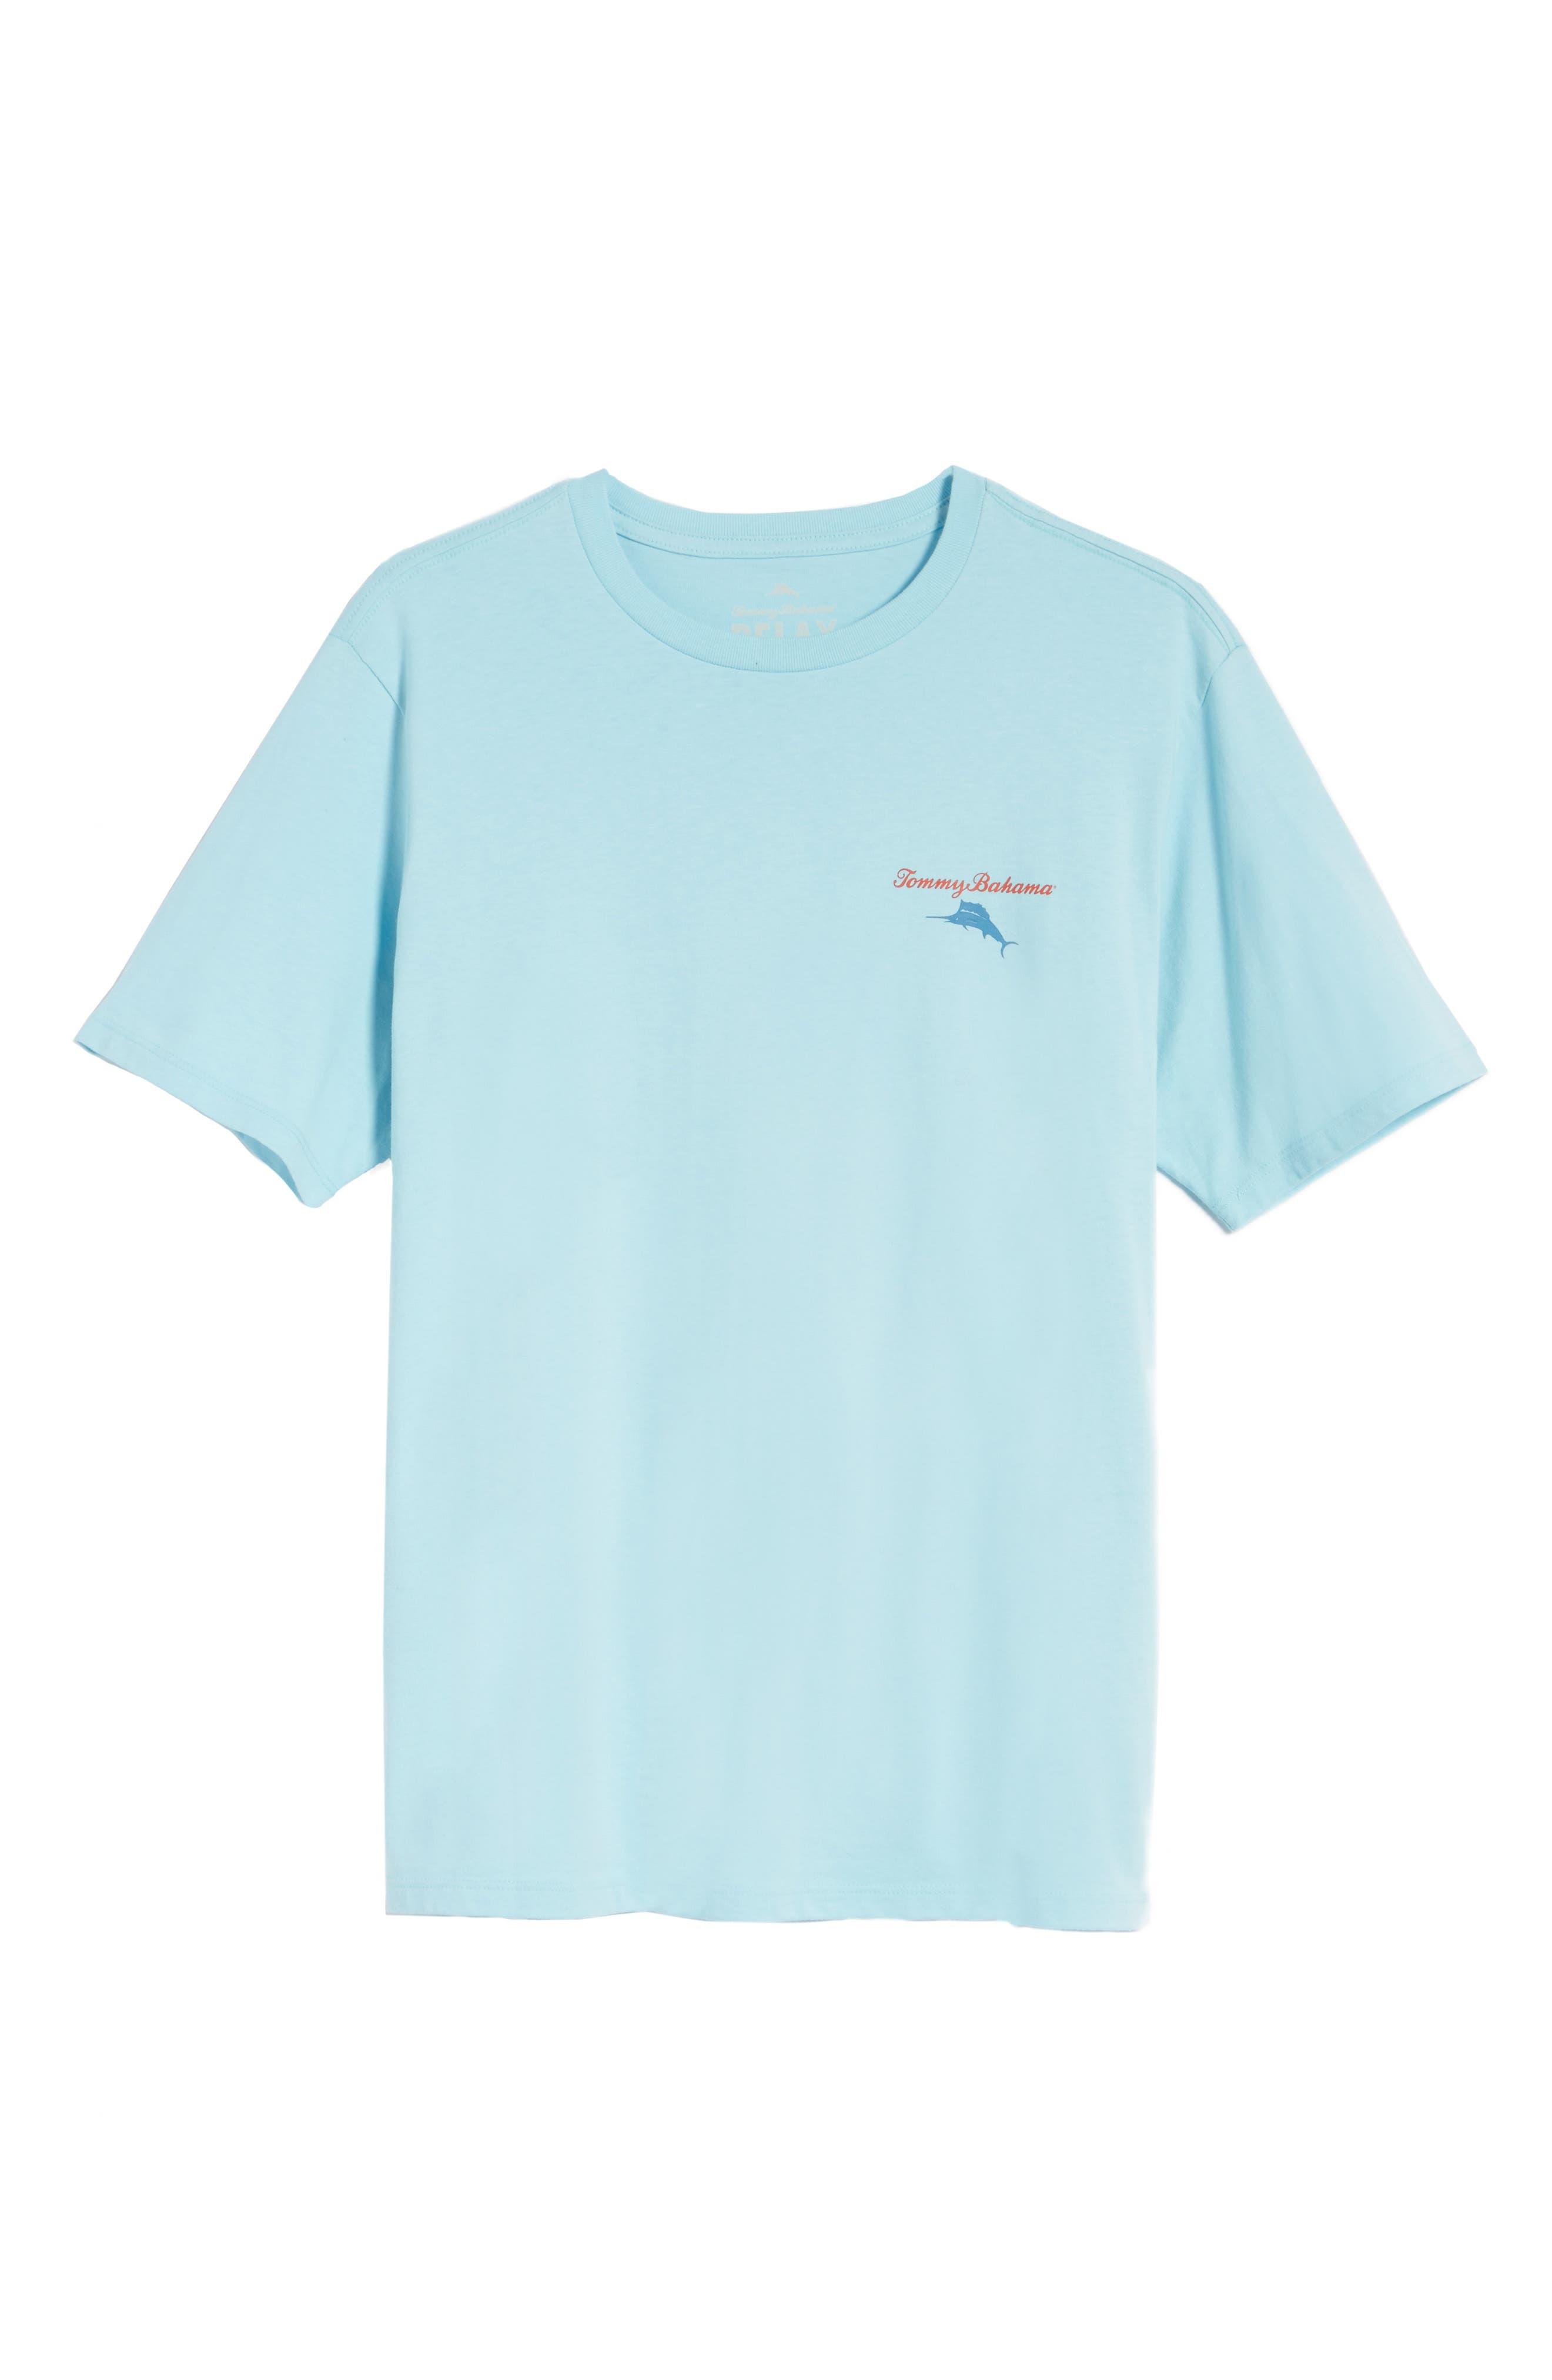 Mr. Ice Guy T-Shirt,                             Alternate thumbnail 6, color,                             400